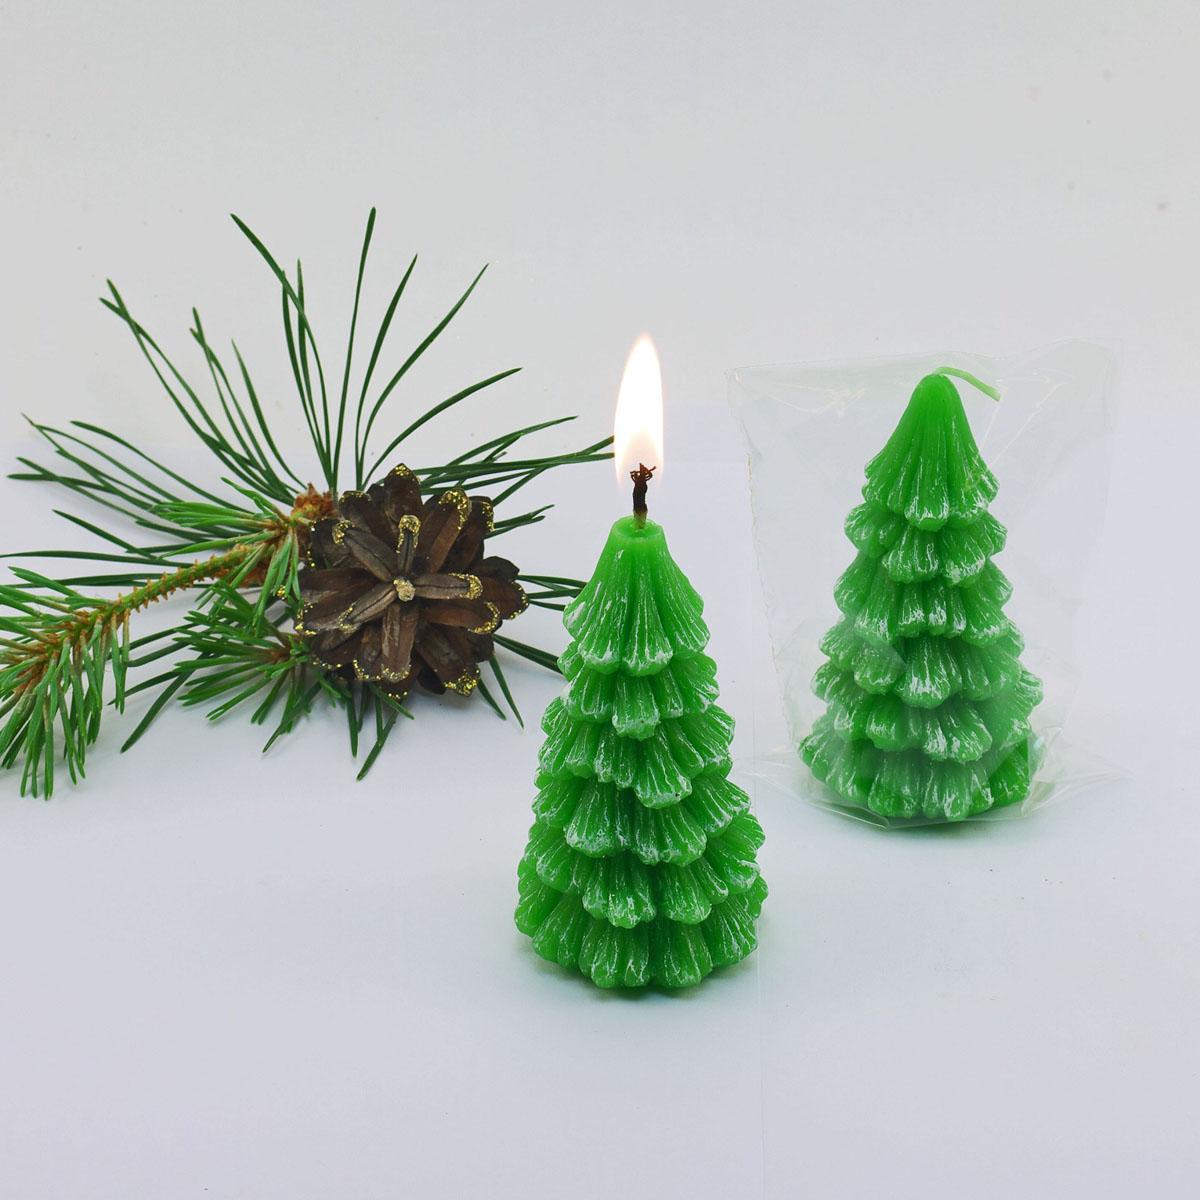 Декоративная свеча Елочка 773752773752Декоративная свеча Елочка 773752 Материал: Парафин